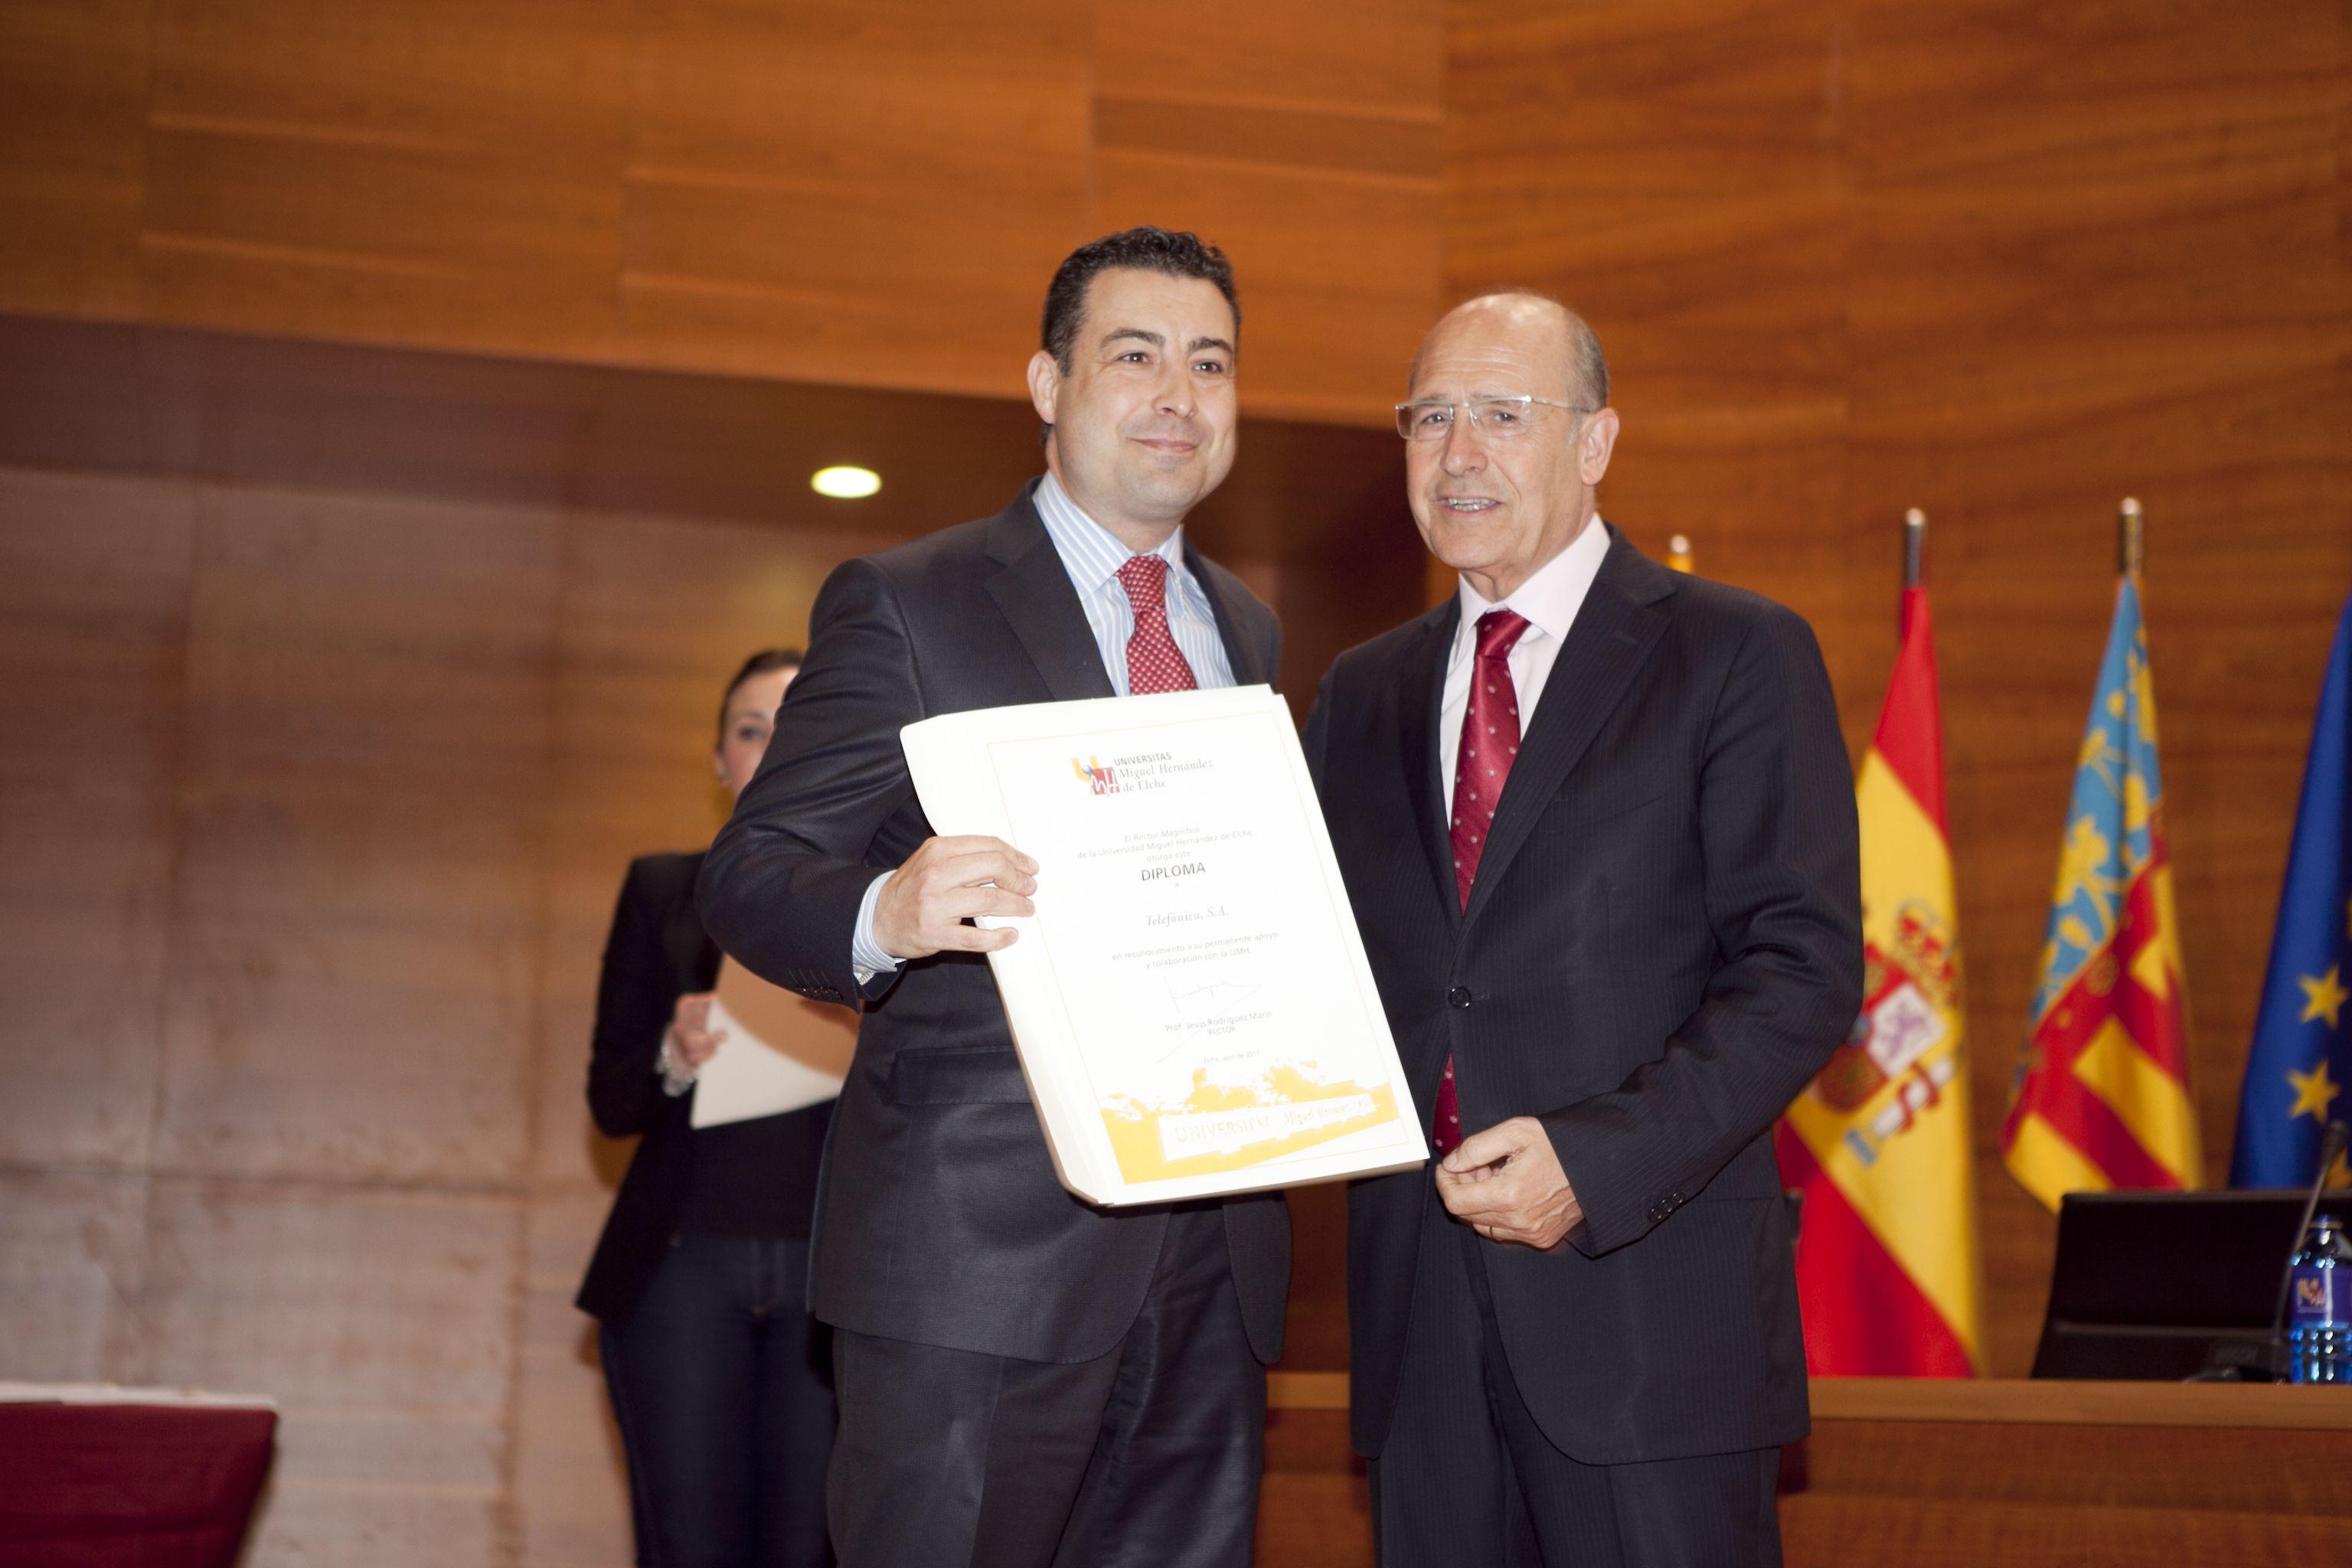 umh-diplomas-rector_mg_6812.jpg